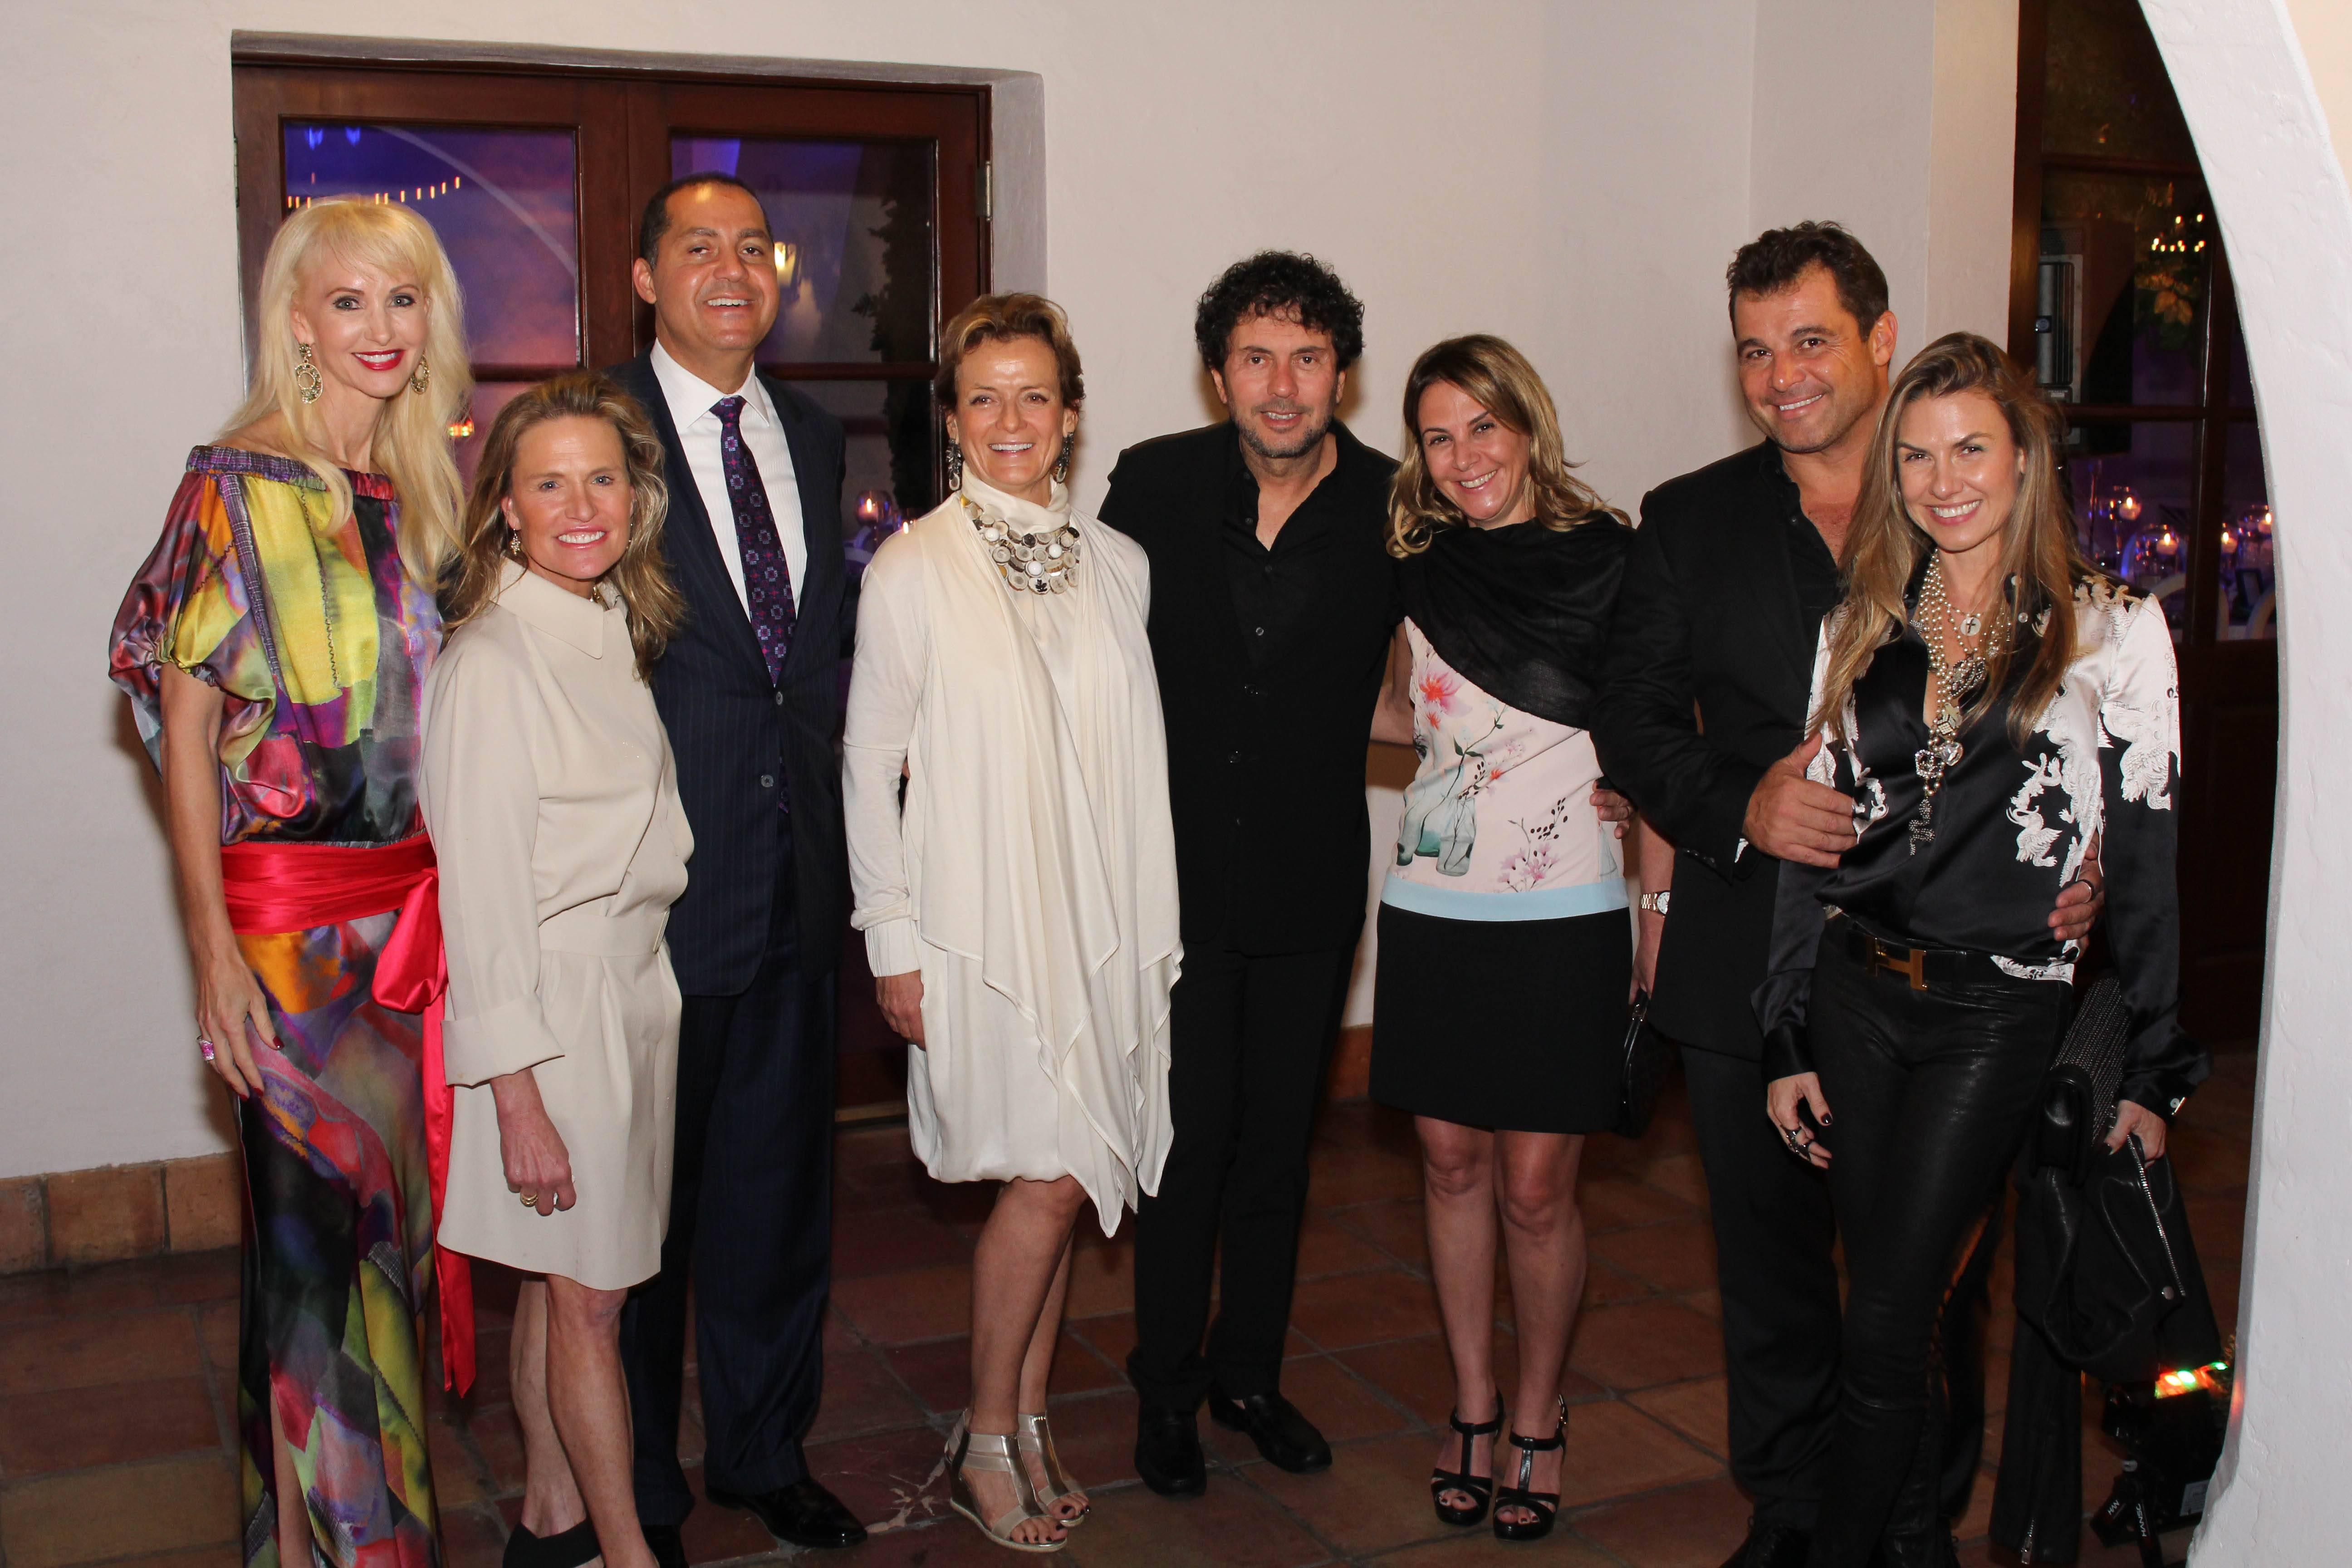 Katrina Peebles, Jennifer Post, Don Peebles, Alexandra Champalimaud, Joao Armentano, Chris Armentano, Paulo Bacchi, Lais Bacchi